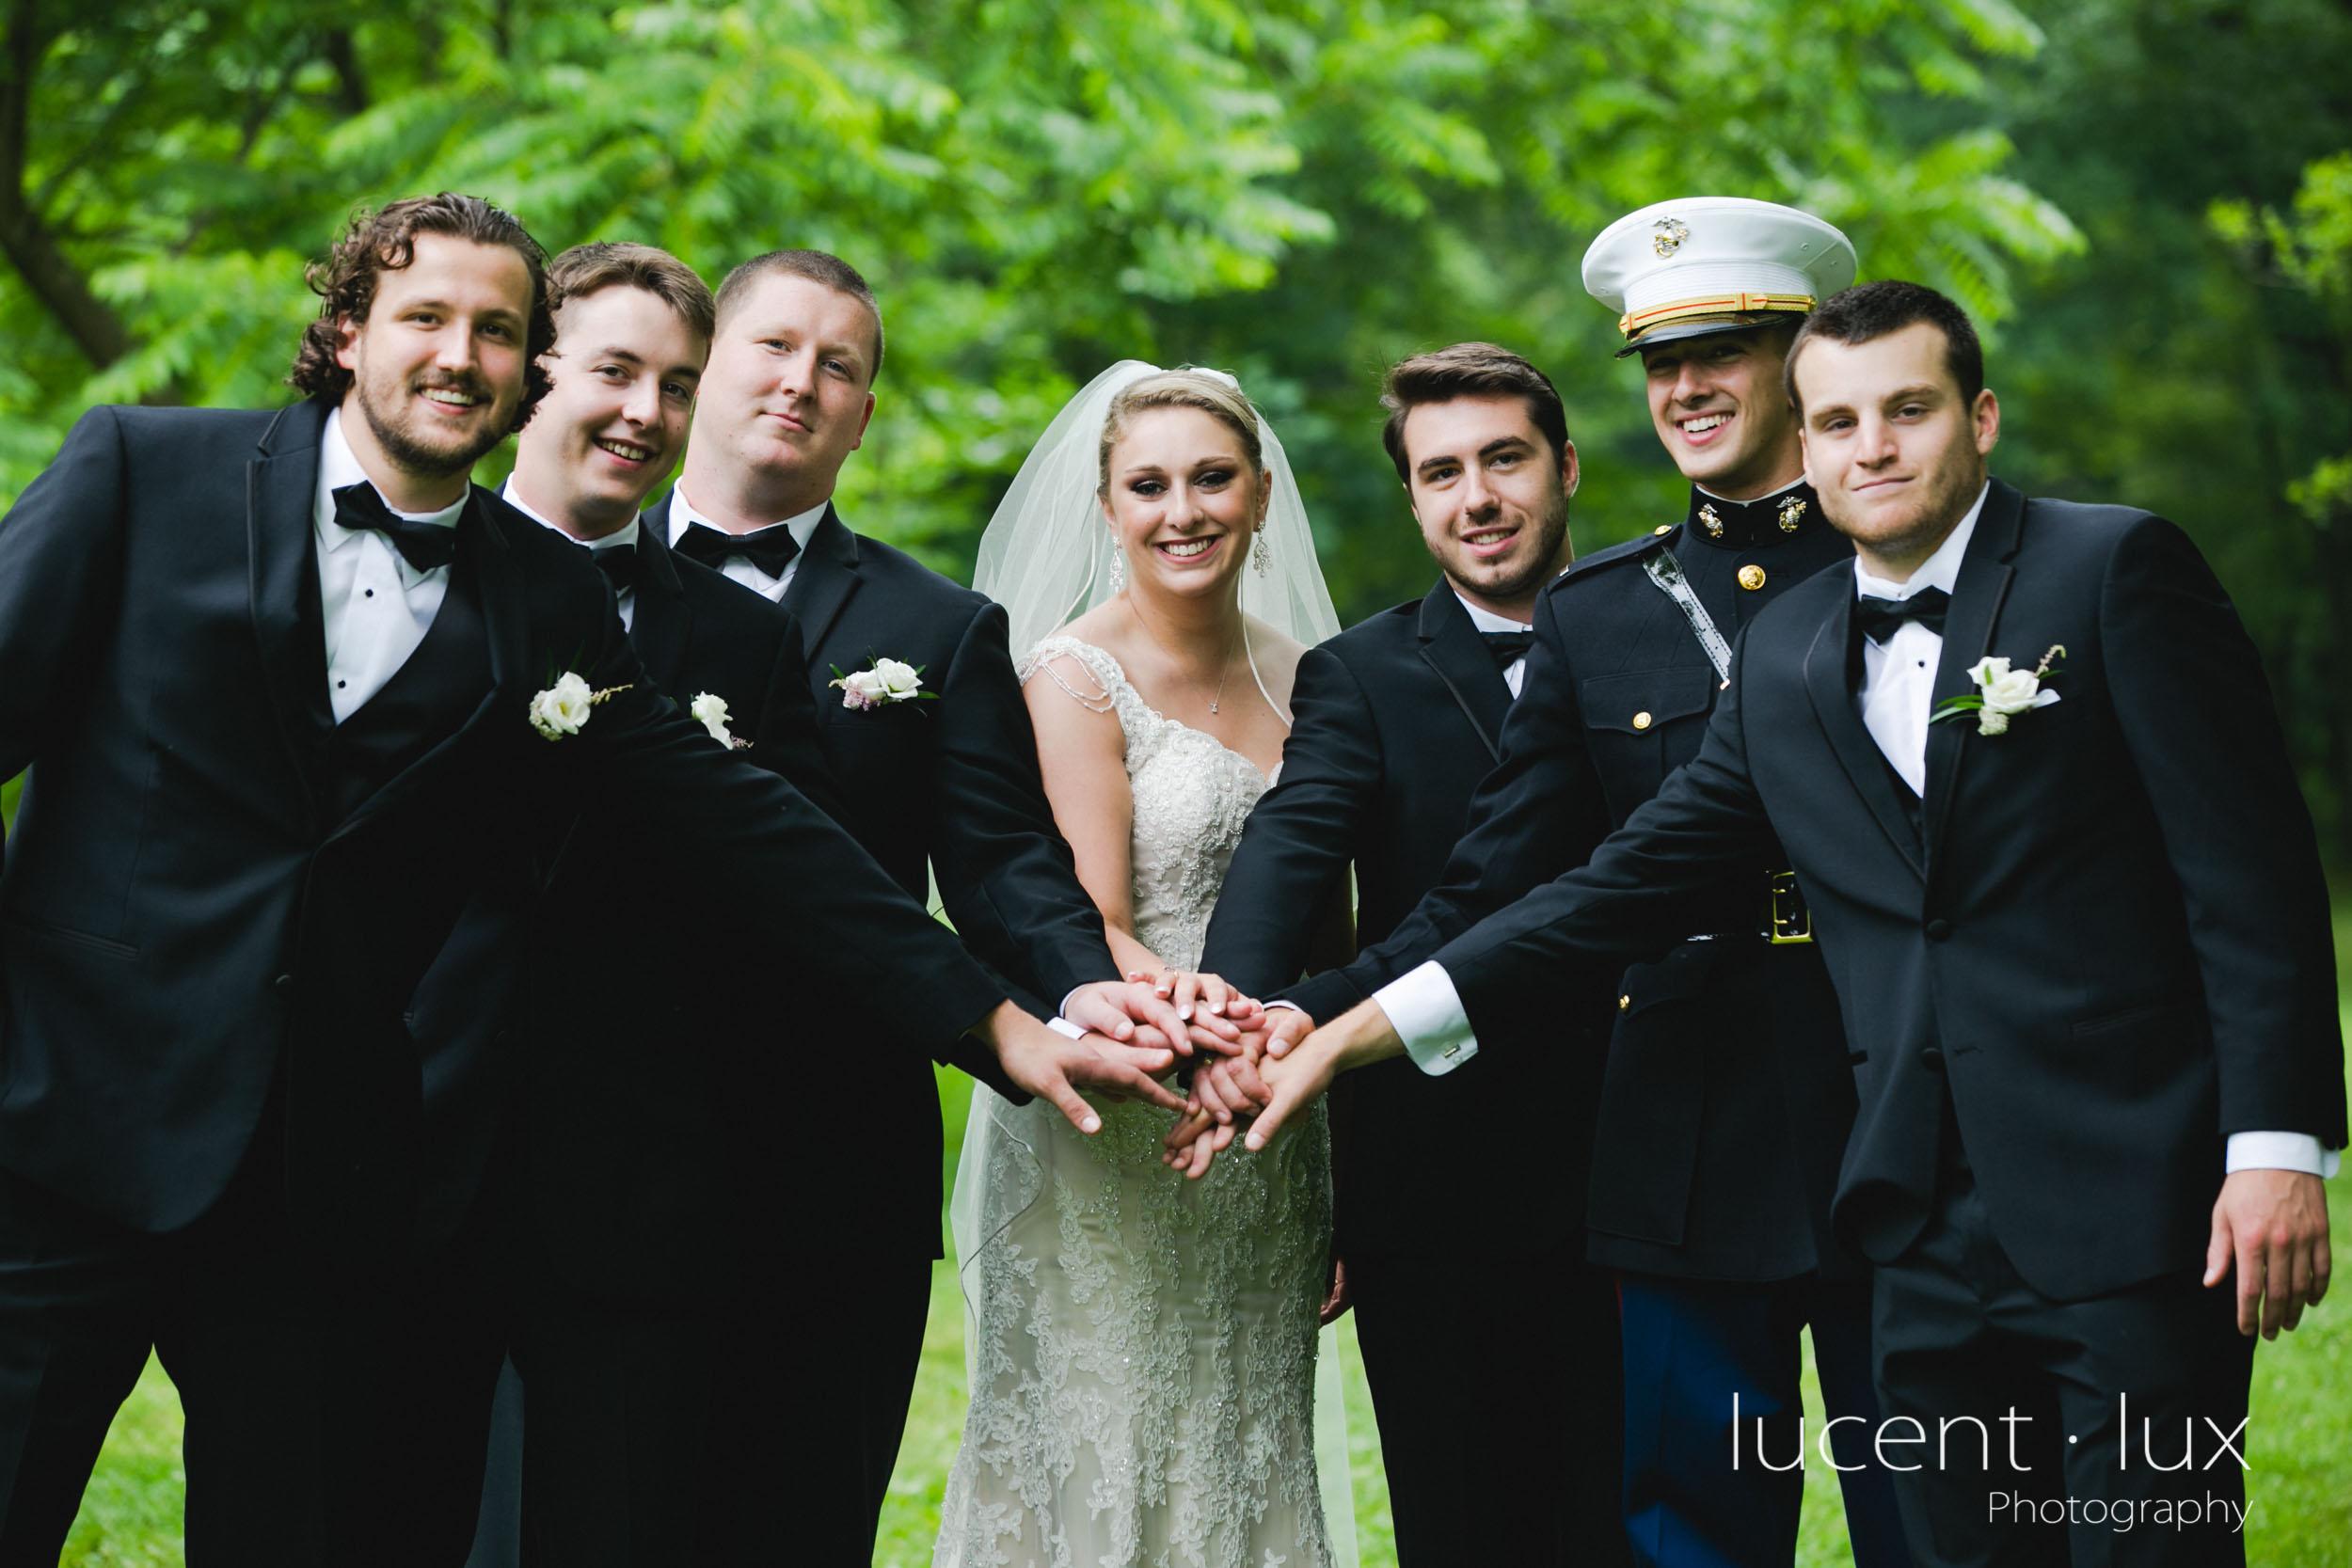 Wedding-Photography-Maryland-Pennsylvania-Photographer-Mendenhall-Inn-Media-Portrait-Event-137.jpg